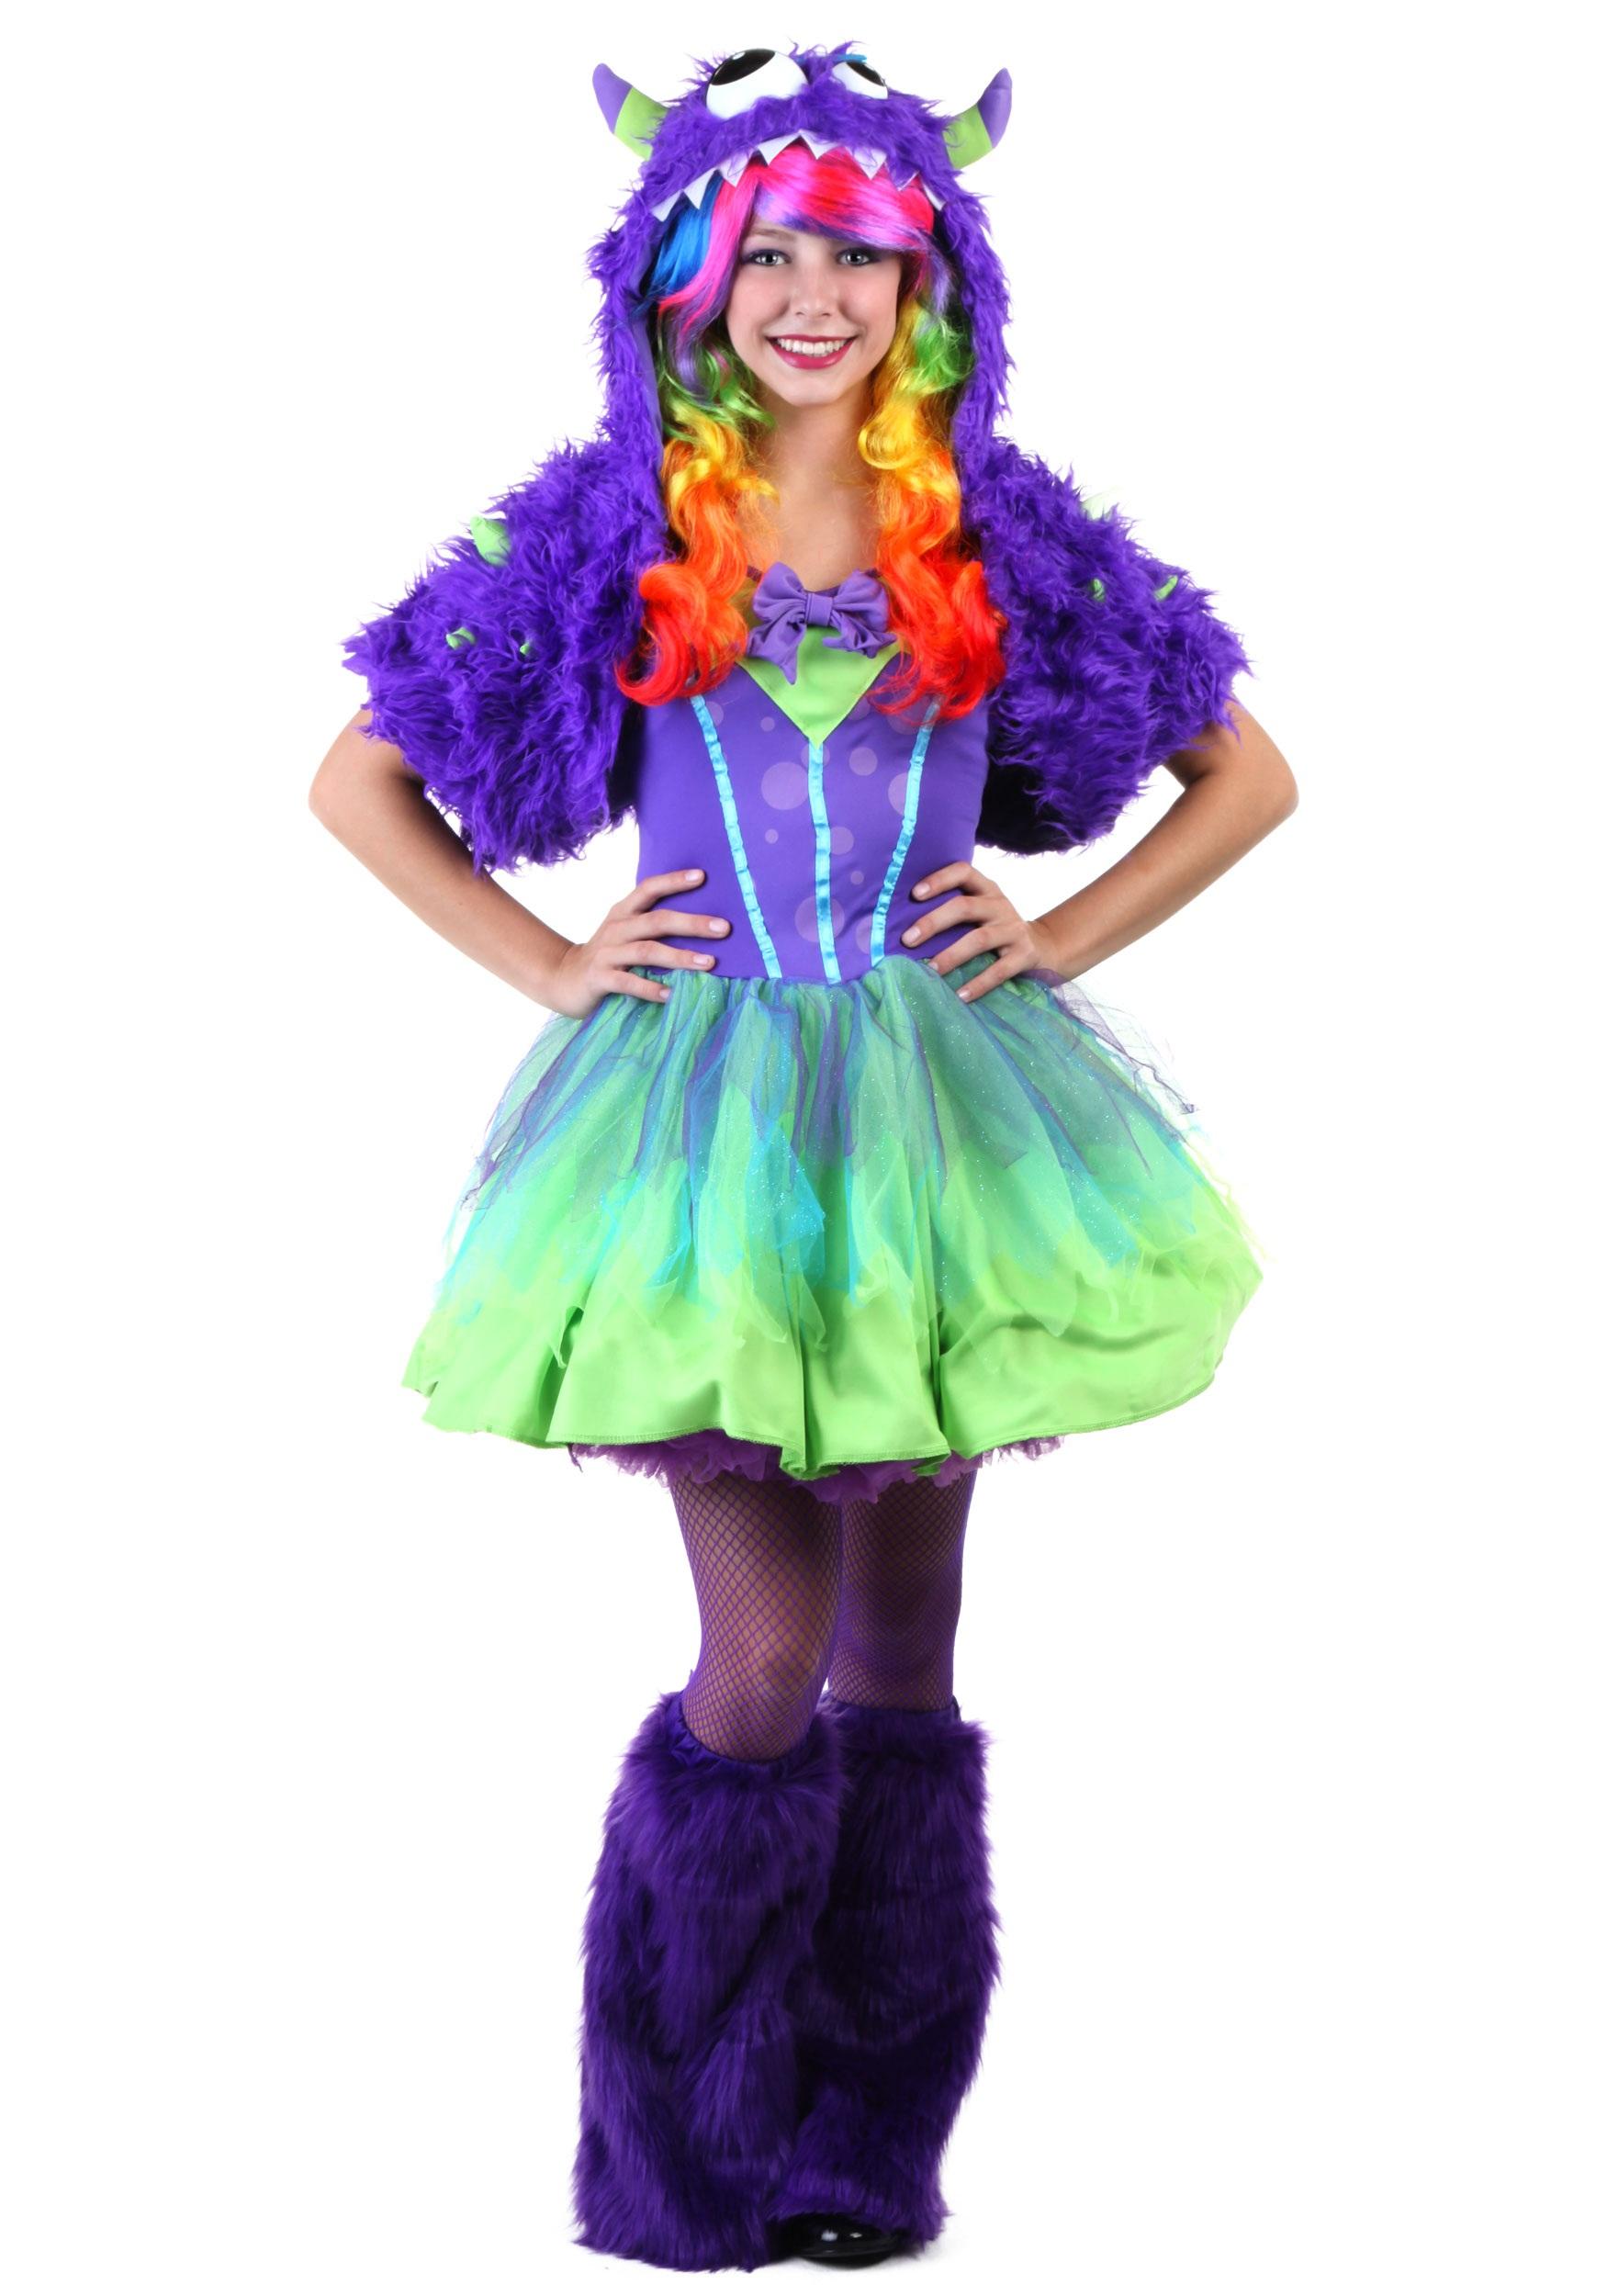 Teen Purple Posh Monster Costume  sc 1 st  Halloween Costumes & Teen Purple Posh Monster Costume - Halloween Costumes